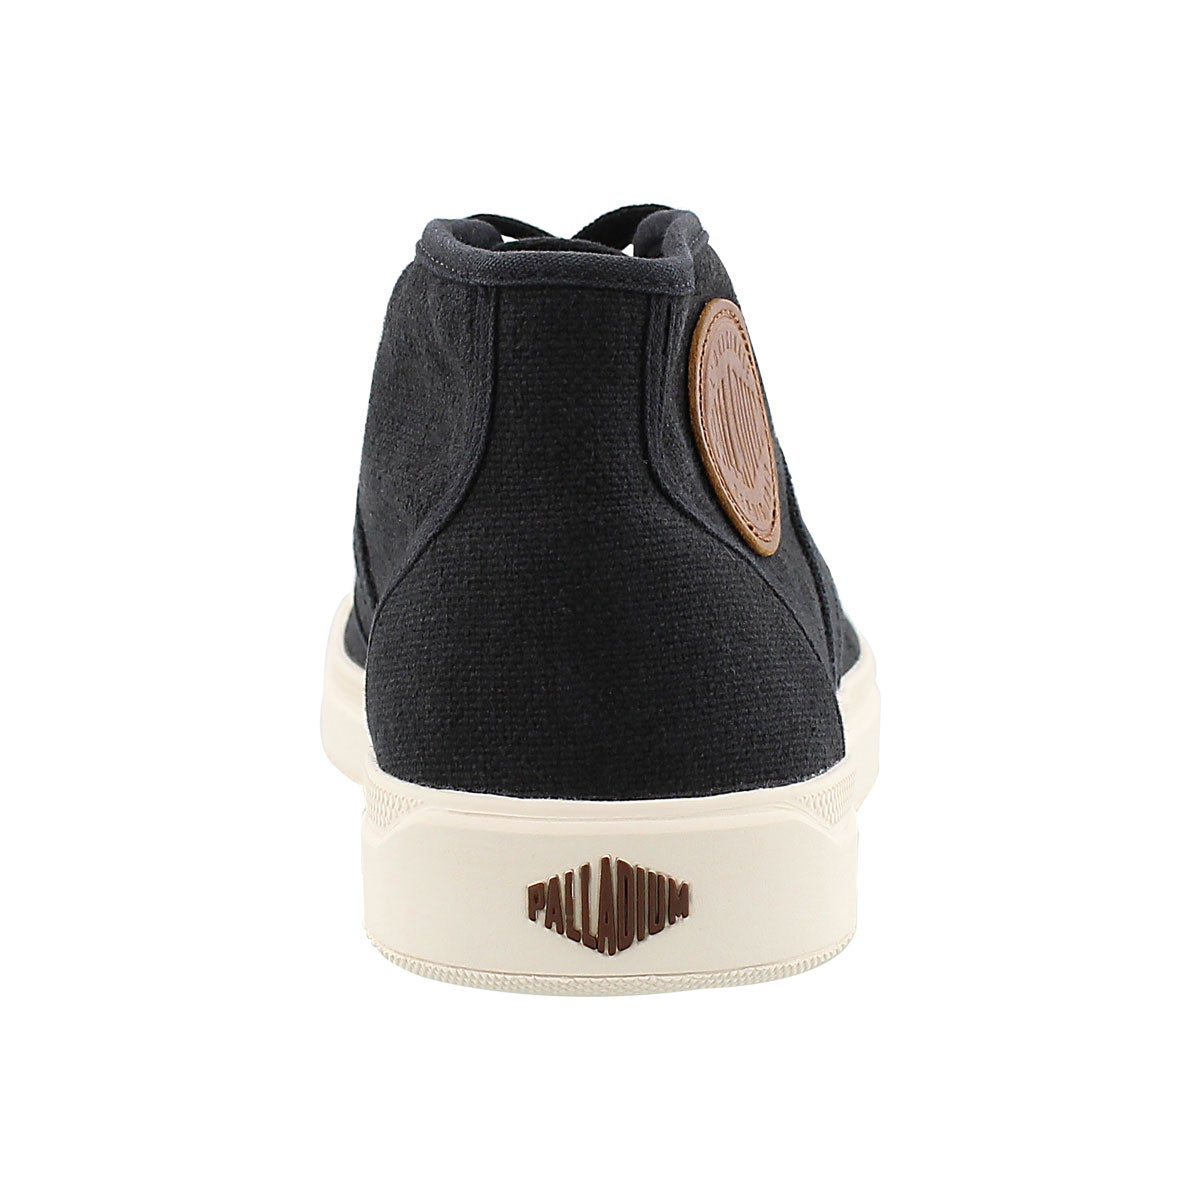 Mns Pallarue Mid black sneaker